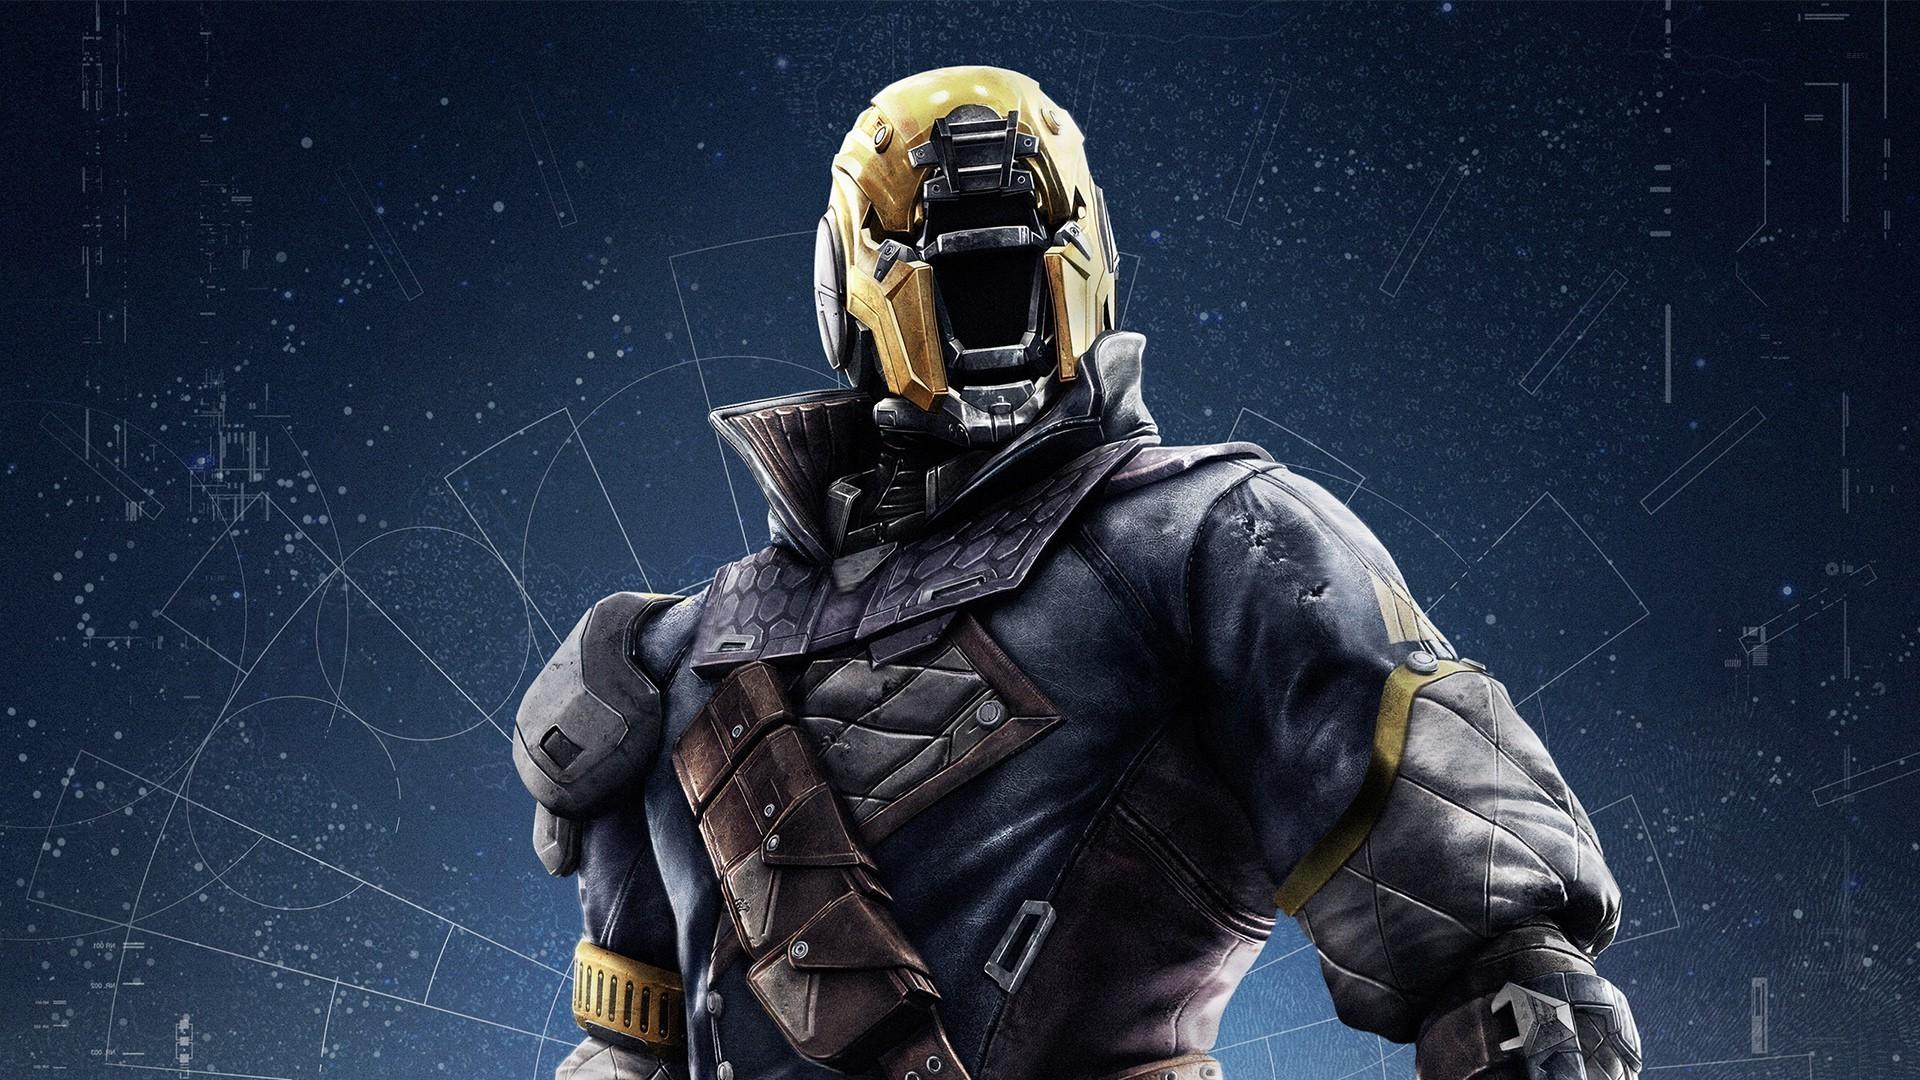 destiny-warlock-wallpaper-wpc9004231